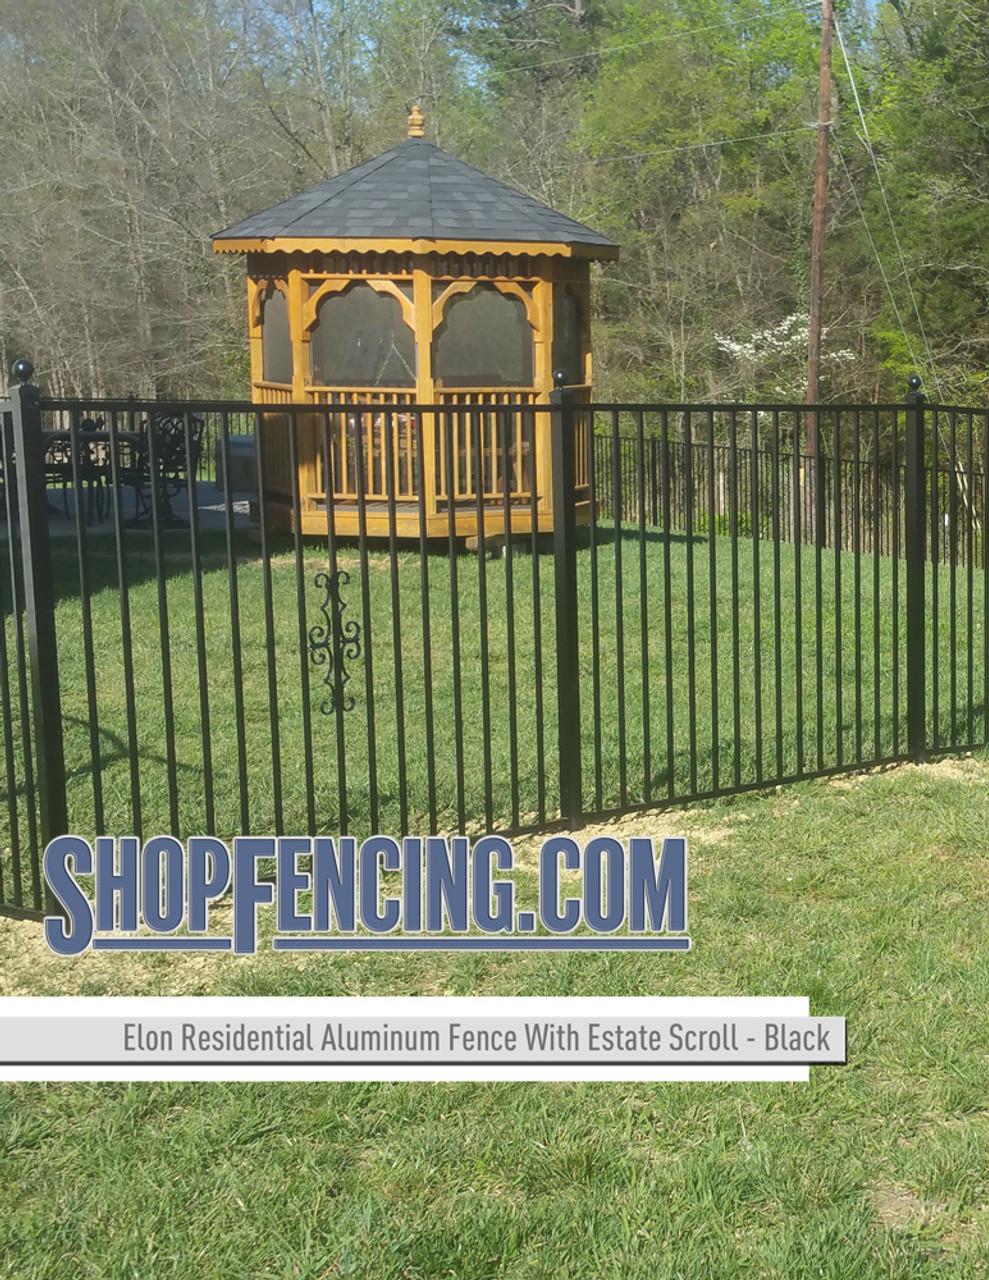 Black Residential Elon Aluminum Fencing From ShopFencing.com